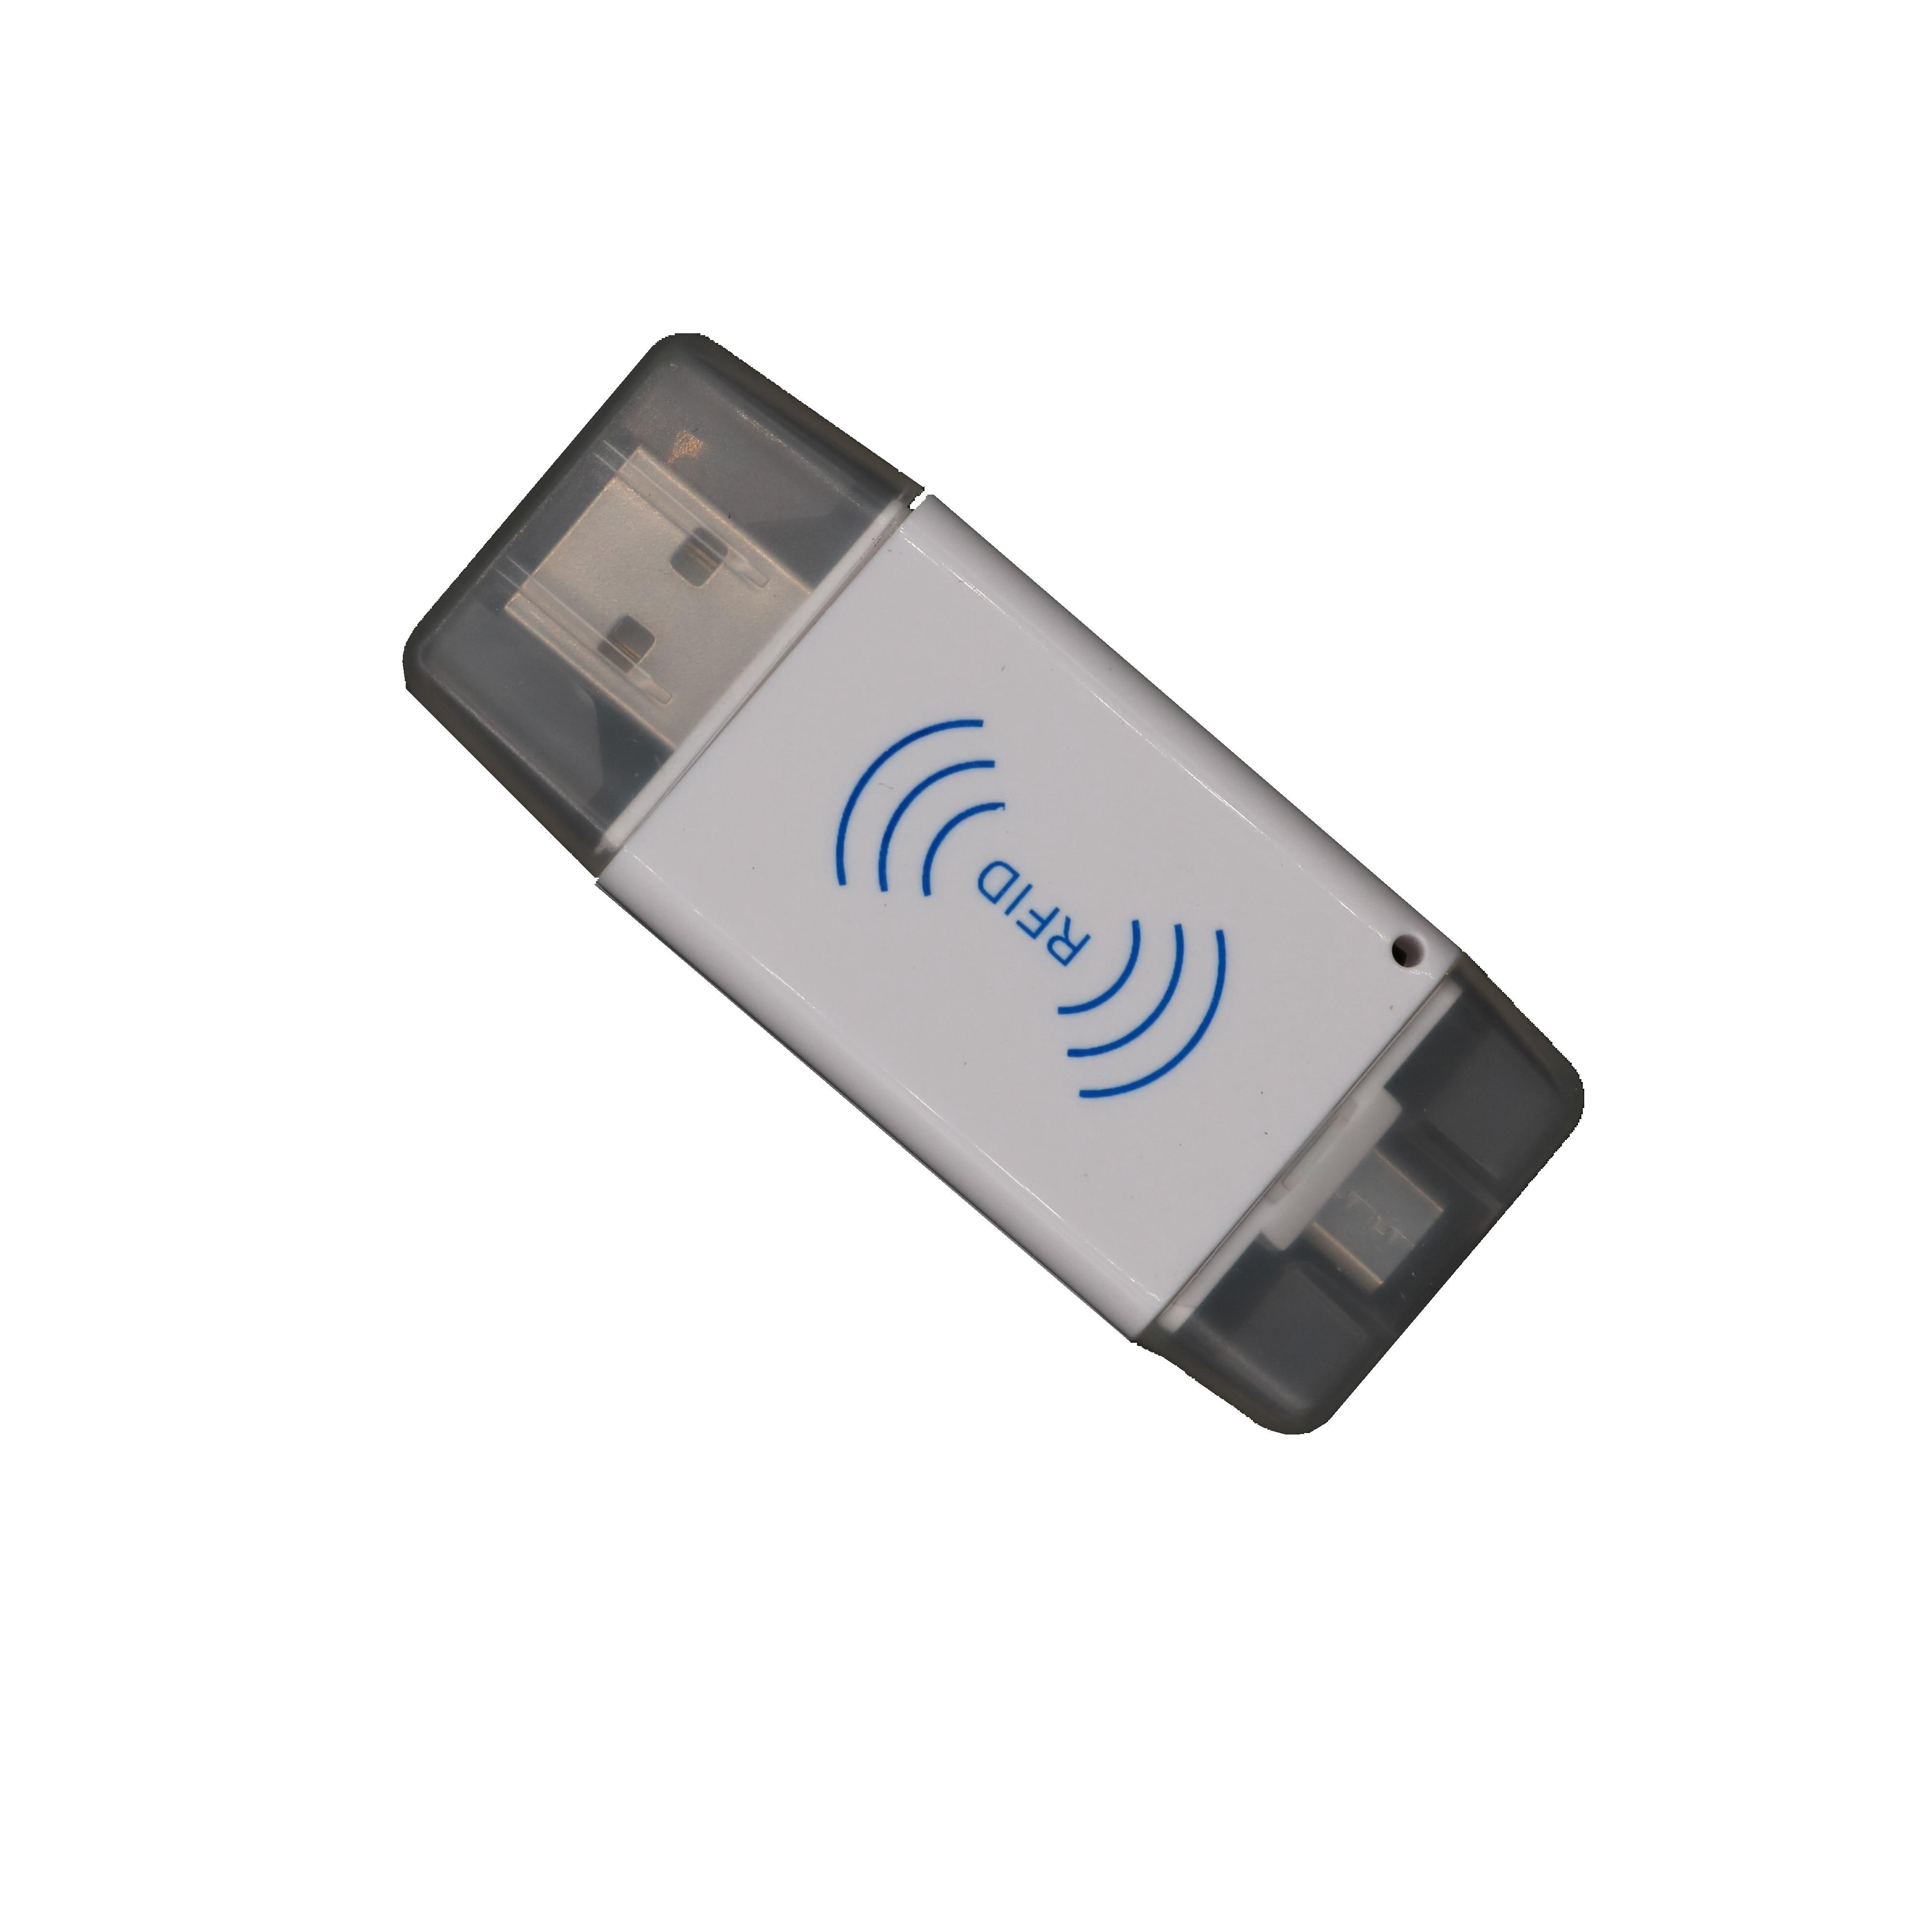 USB 125Khz RFID EM card reader mirco usb interface for Android 125khz rfid reader